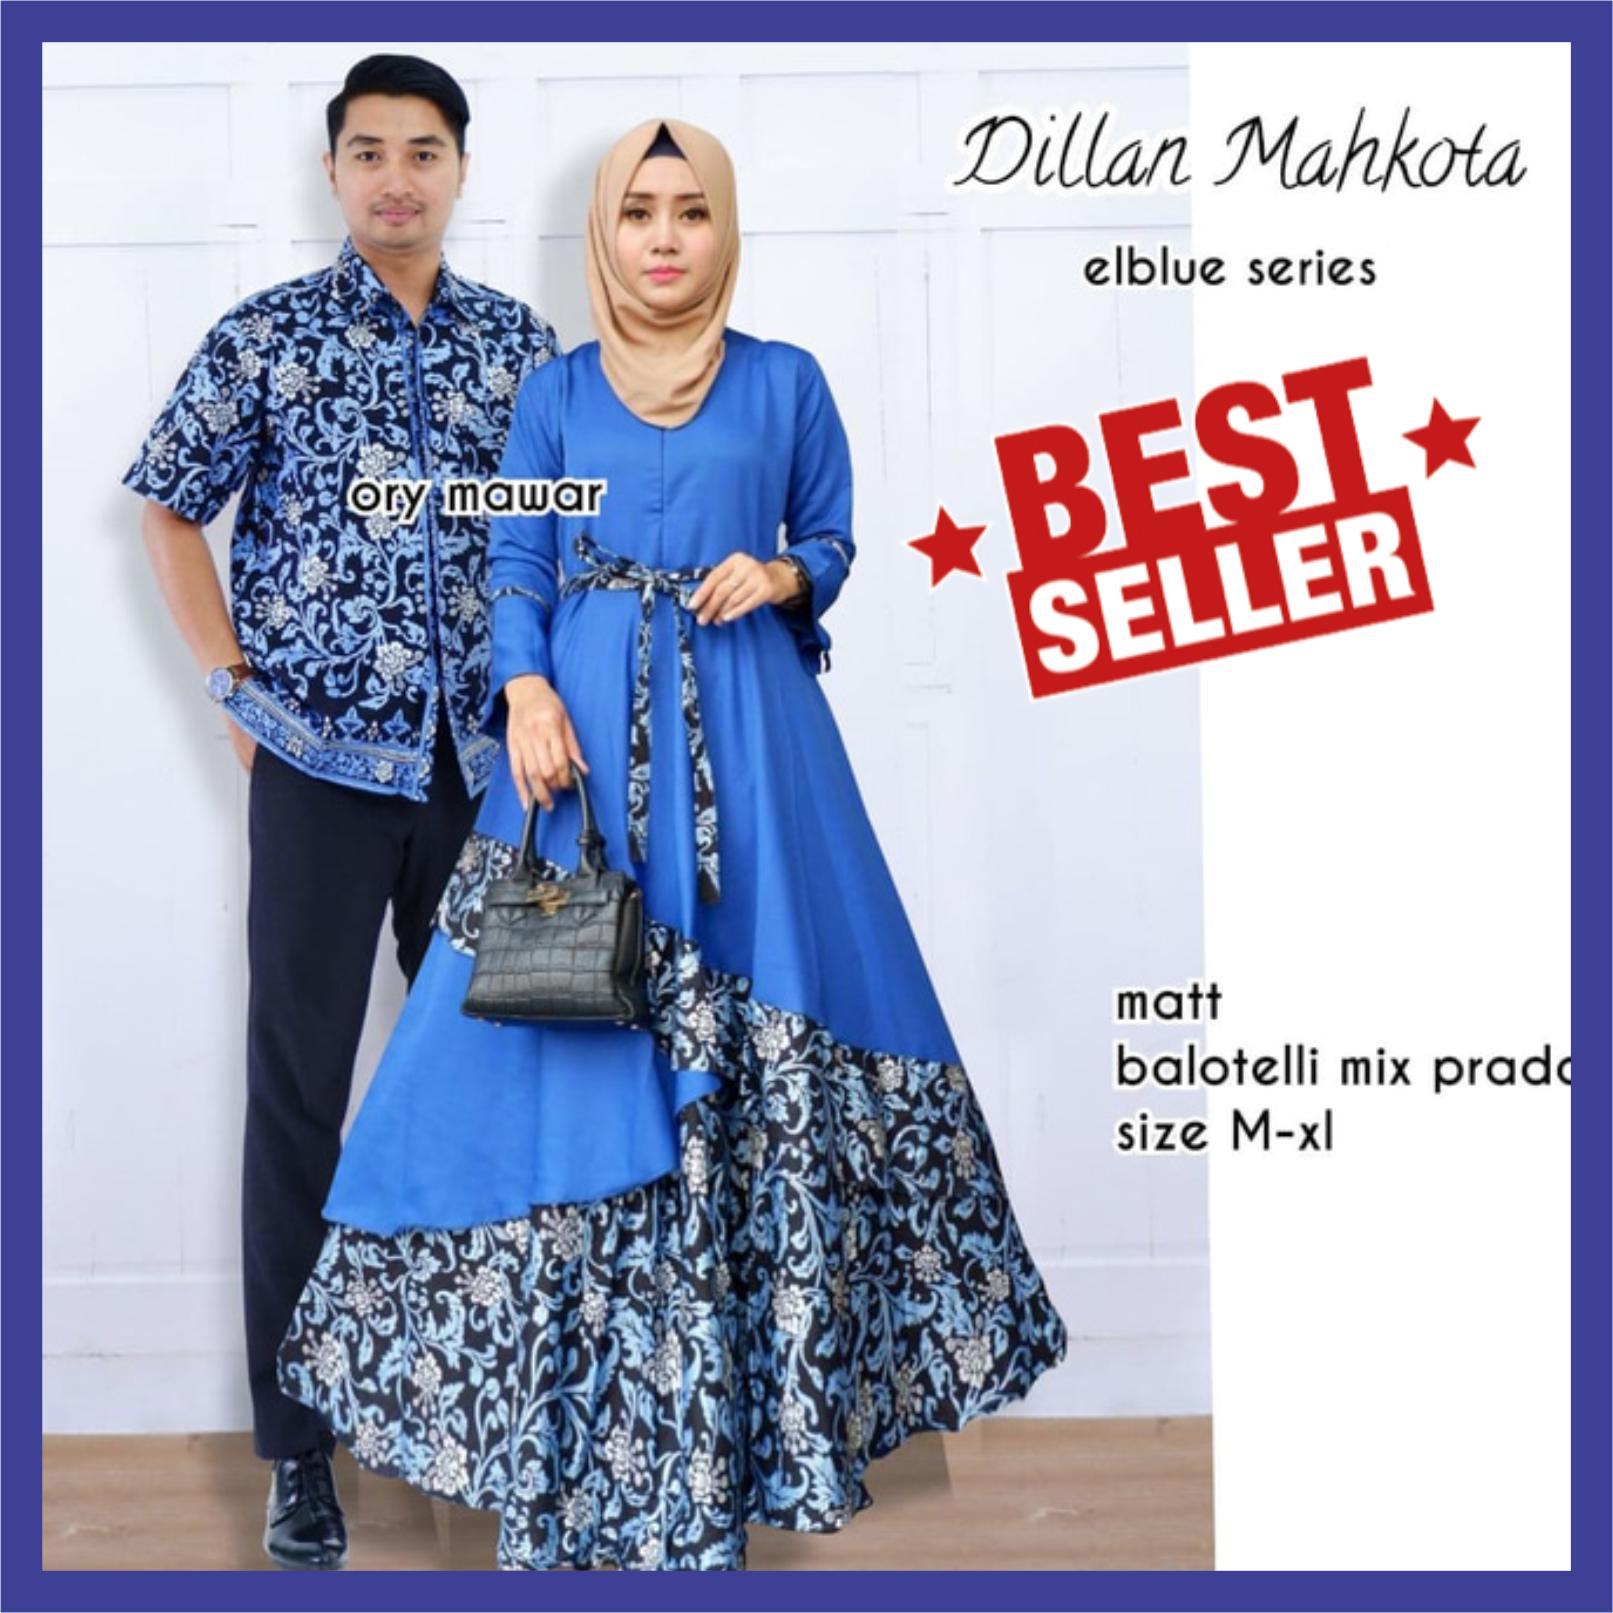 Batik Couple / Baju Batik Sarimbit / Batik Couple Modern / Batik Couple Muslim / Kemeja Batik / Batik Couple Kondangan Dillan Mahkota